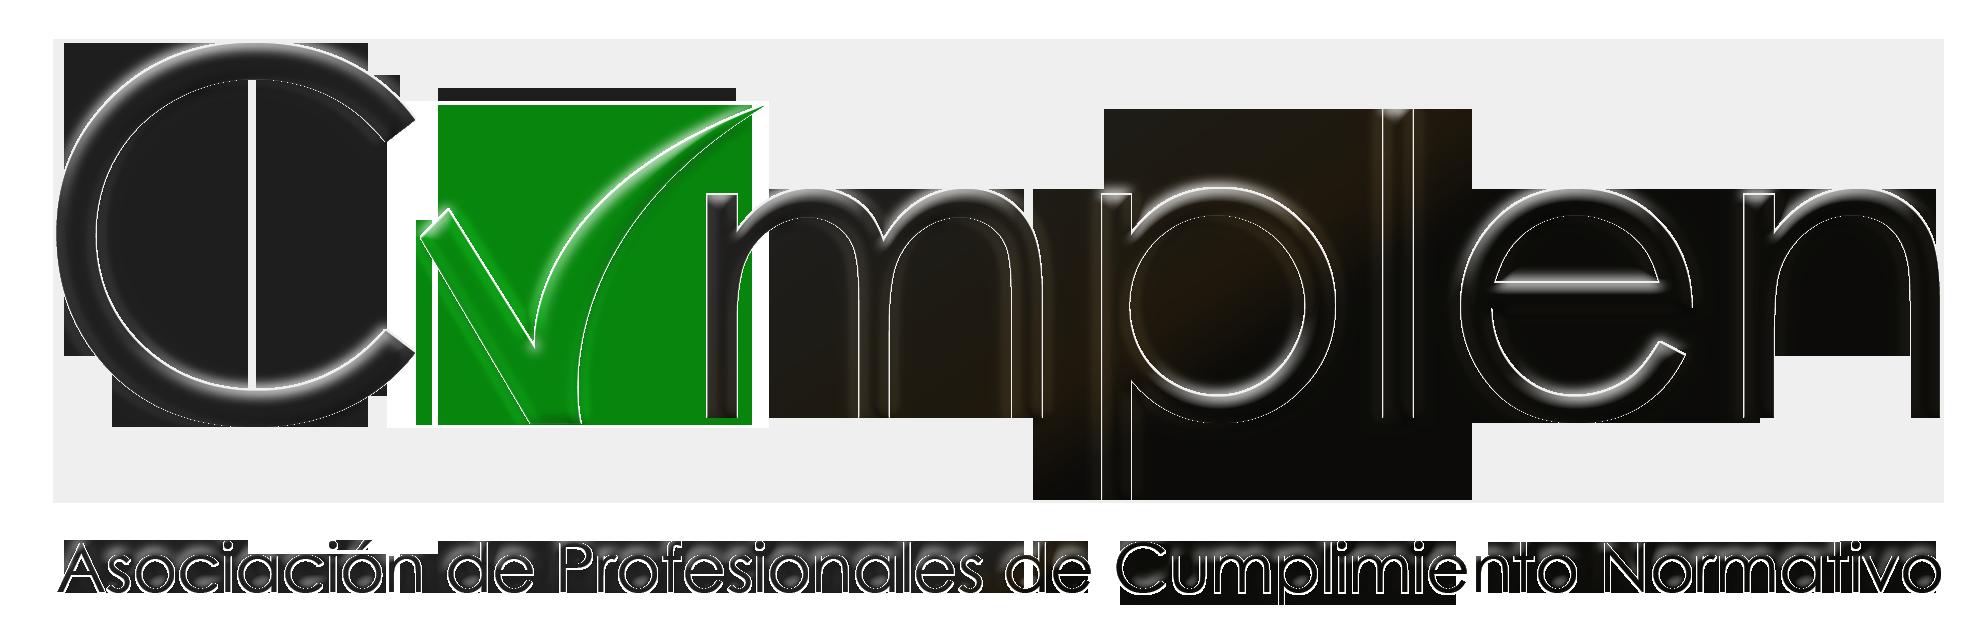 Certificación en Compliance de CUMPLEN